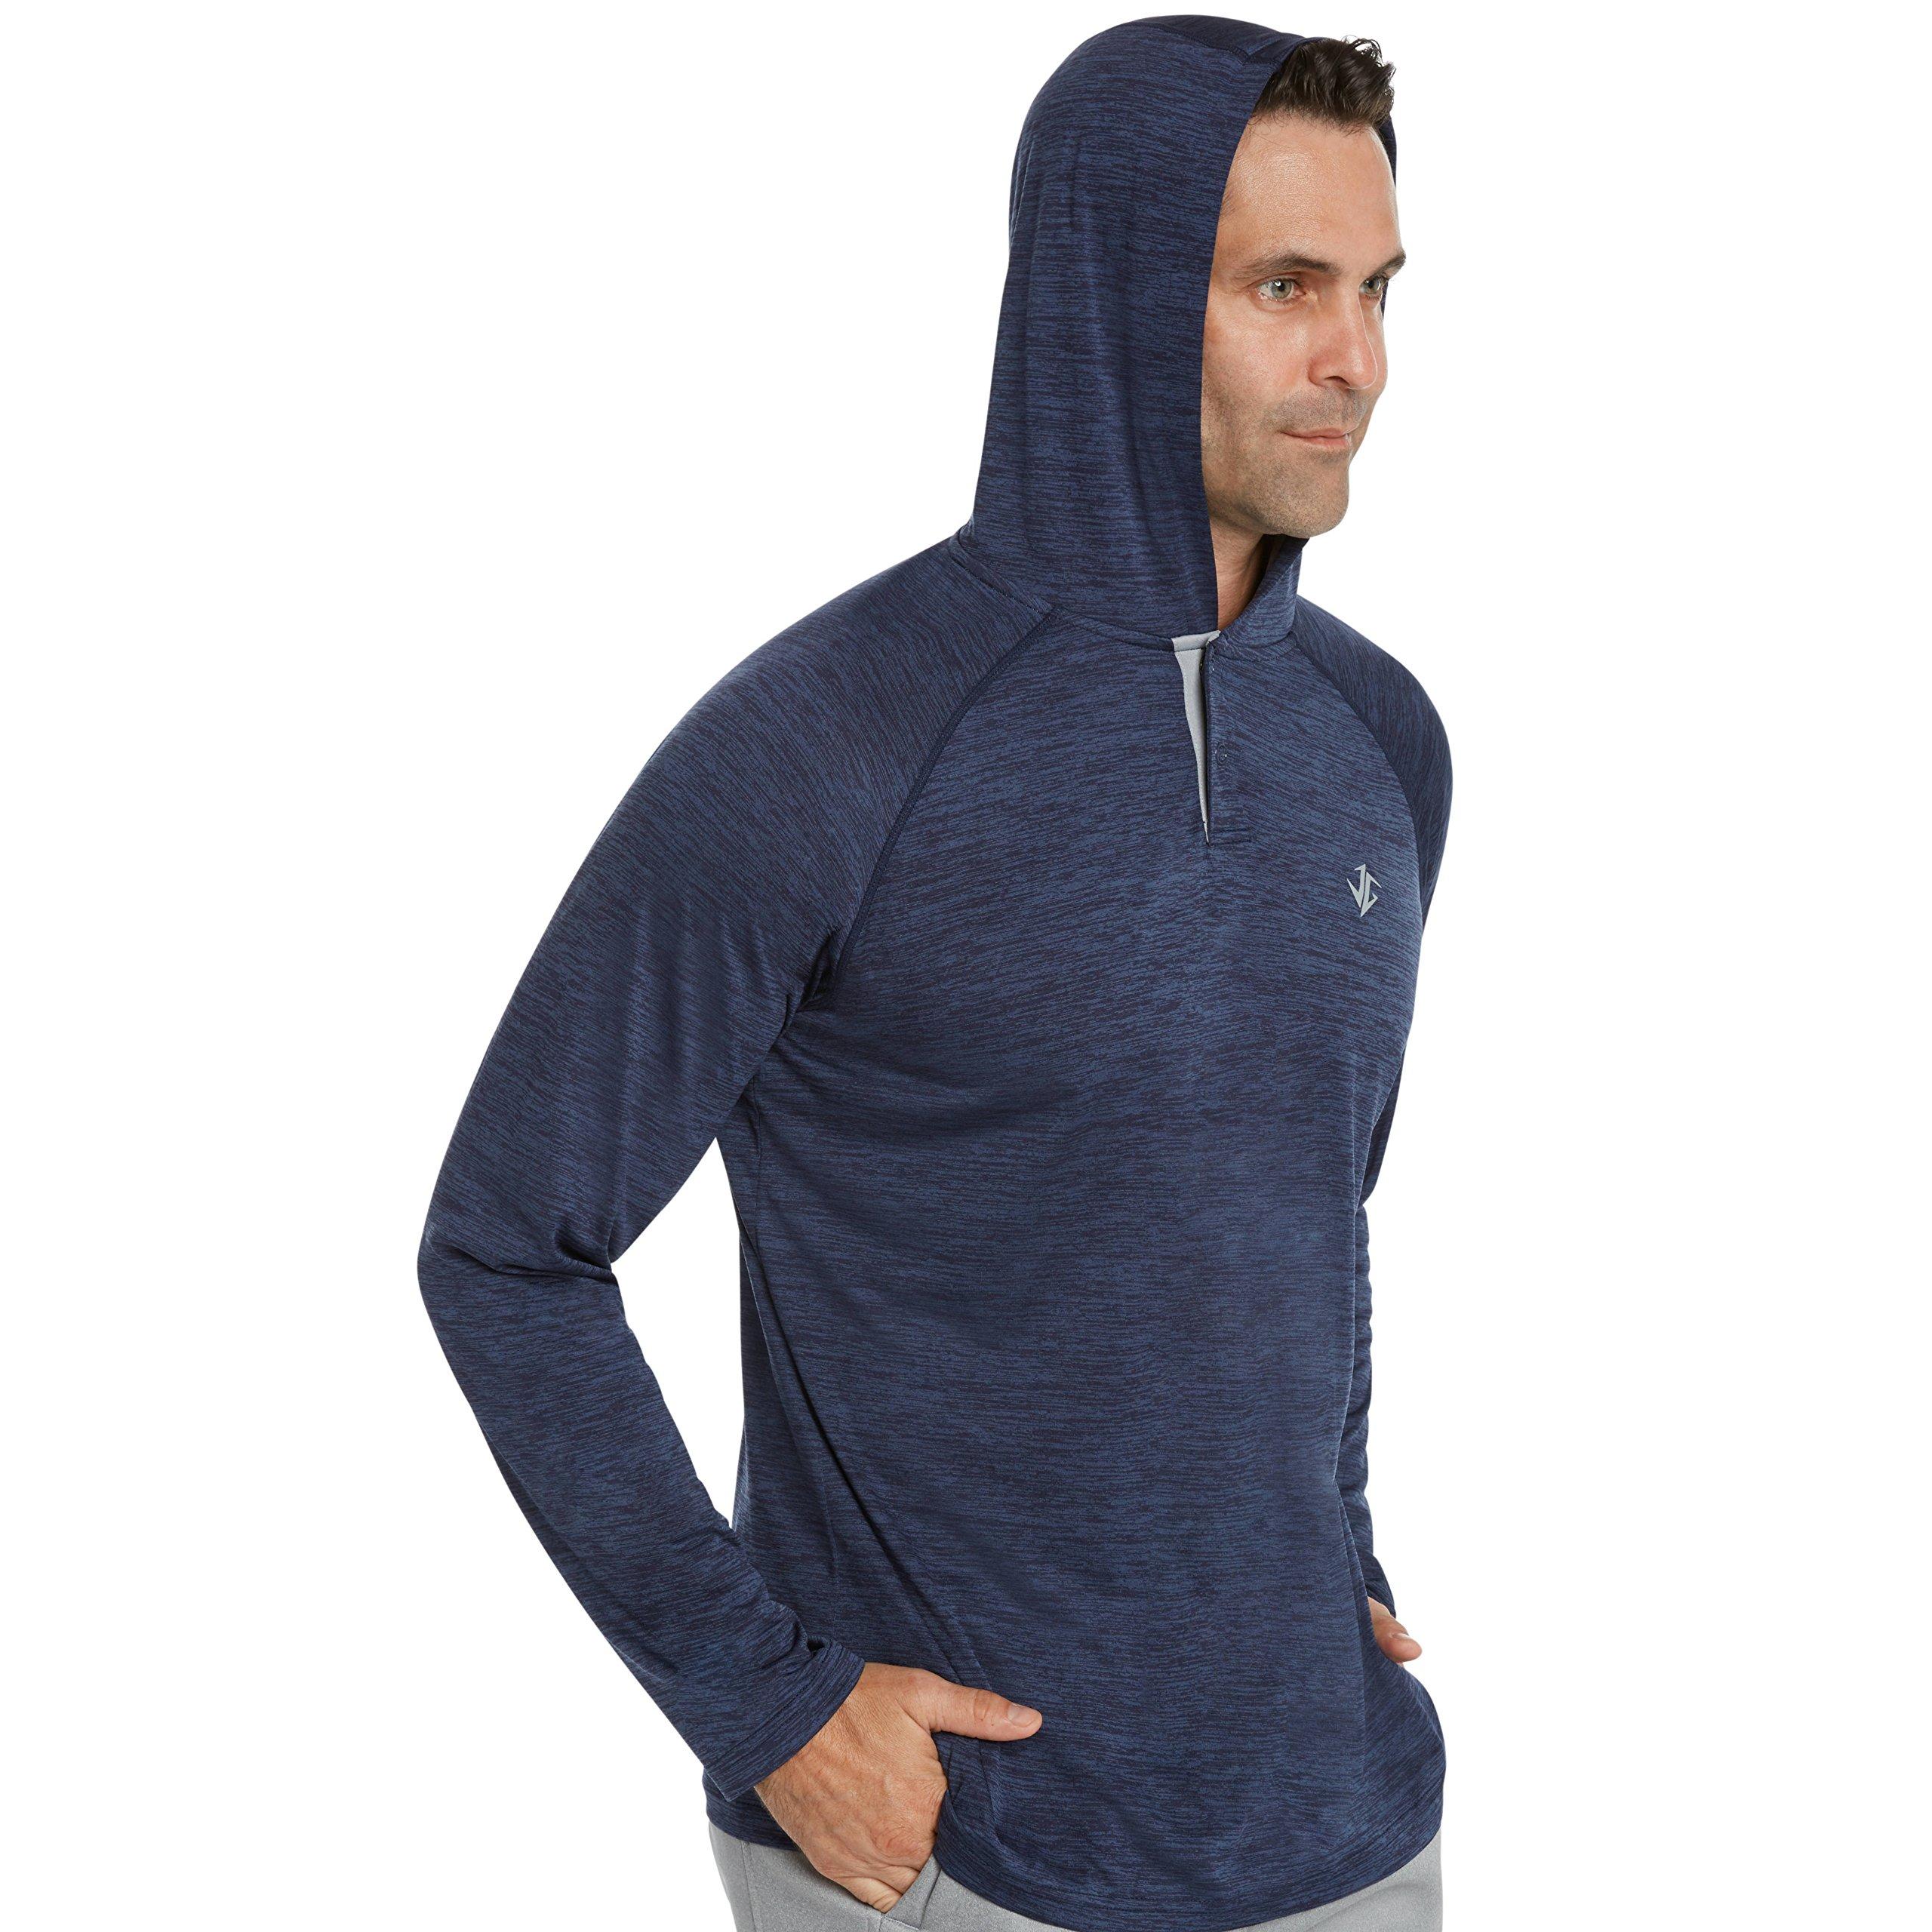 Jolt Gear Mens Hoodies Pullover - Long Sleeve Casual Hoodie for Men - Lightweight Thin Hooded Sweater T Shirt by Jolt Gear